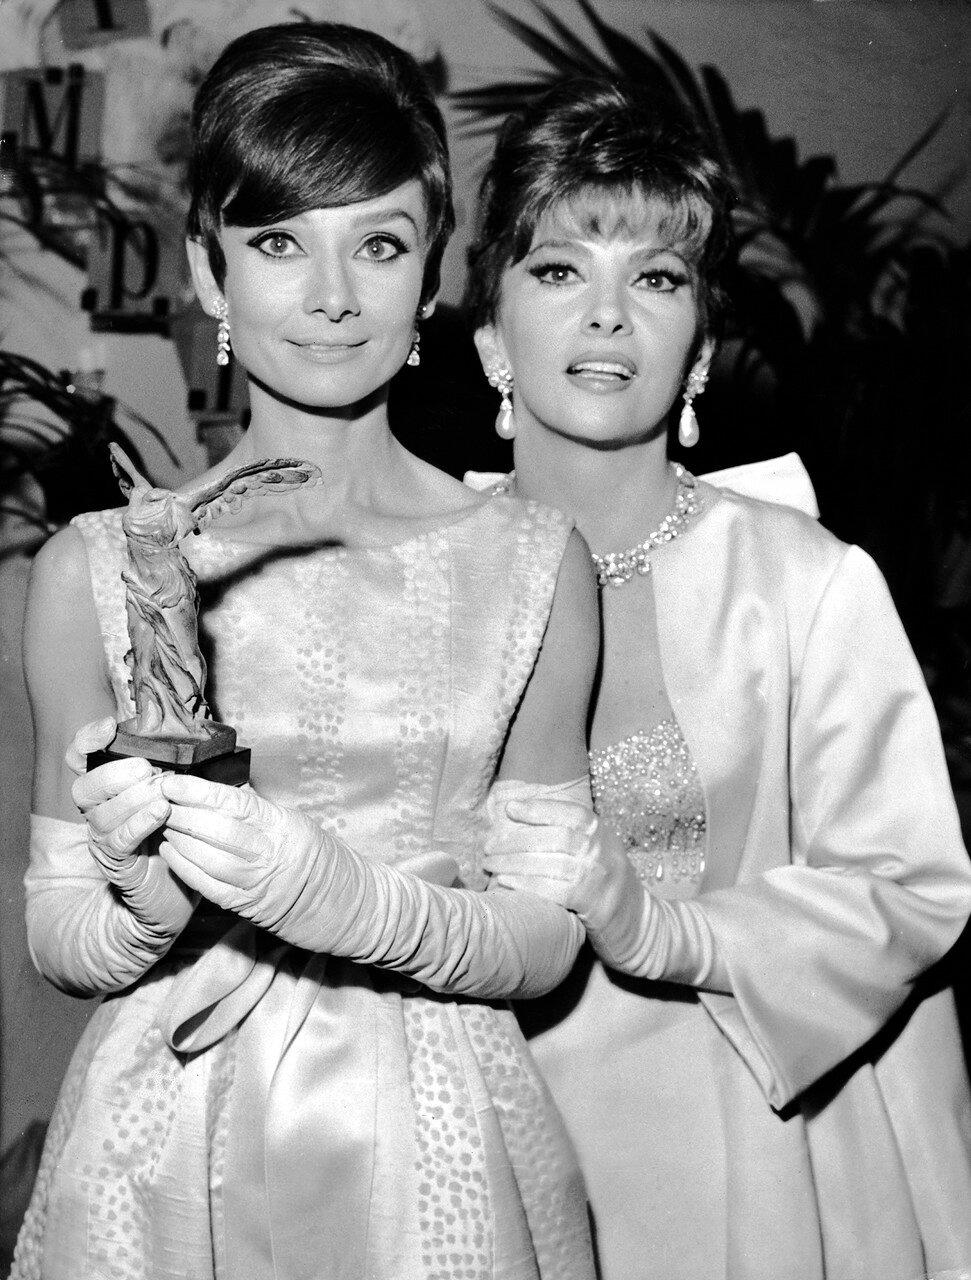 Gina LOLLOBRIGIDA und Audrey HEPBURN, 1965